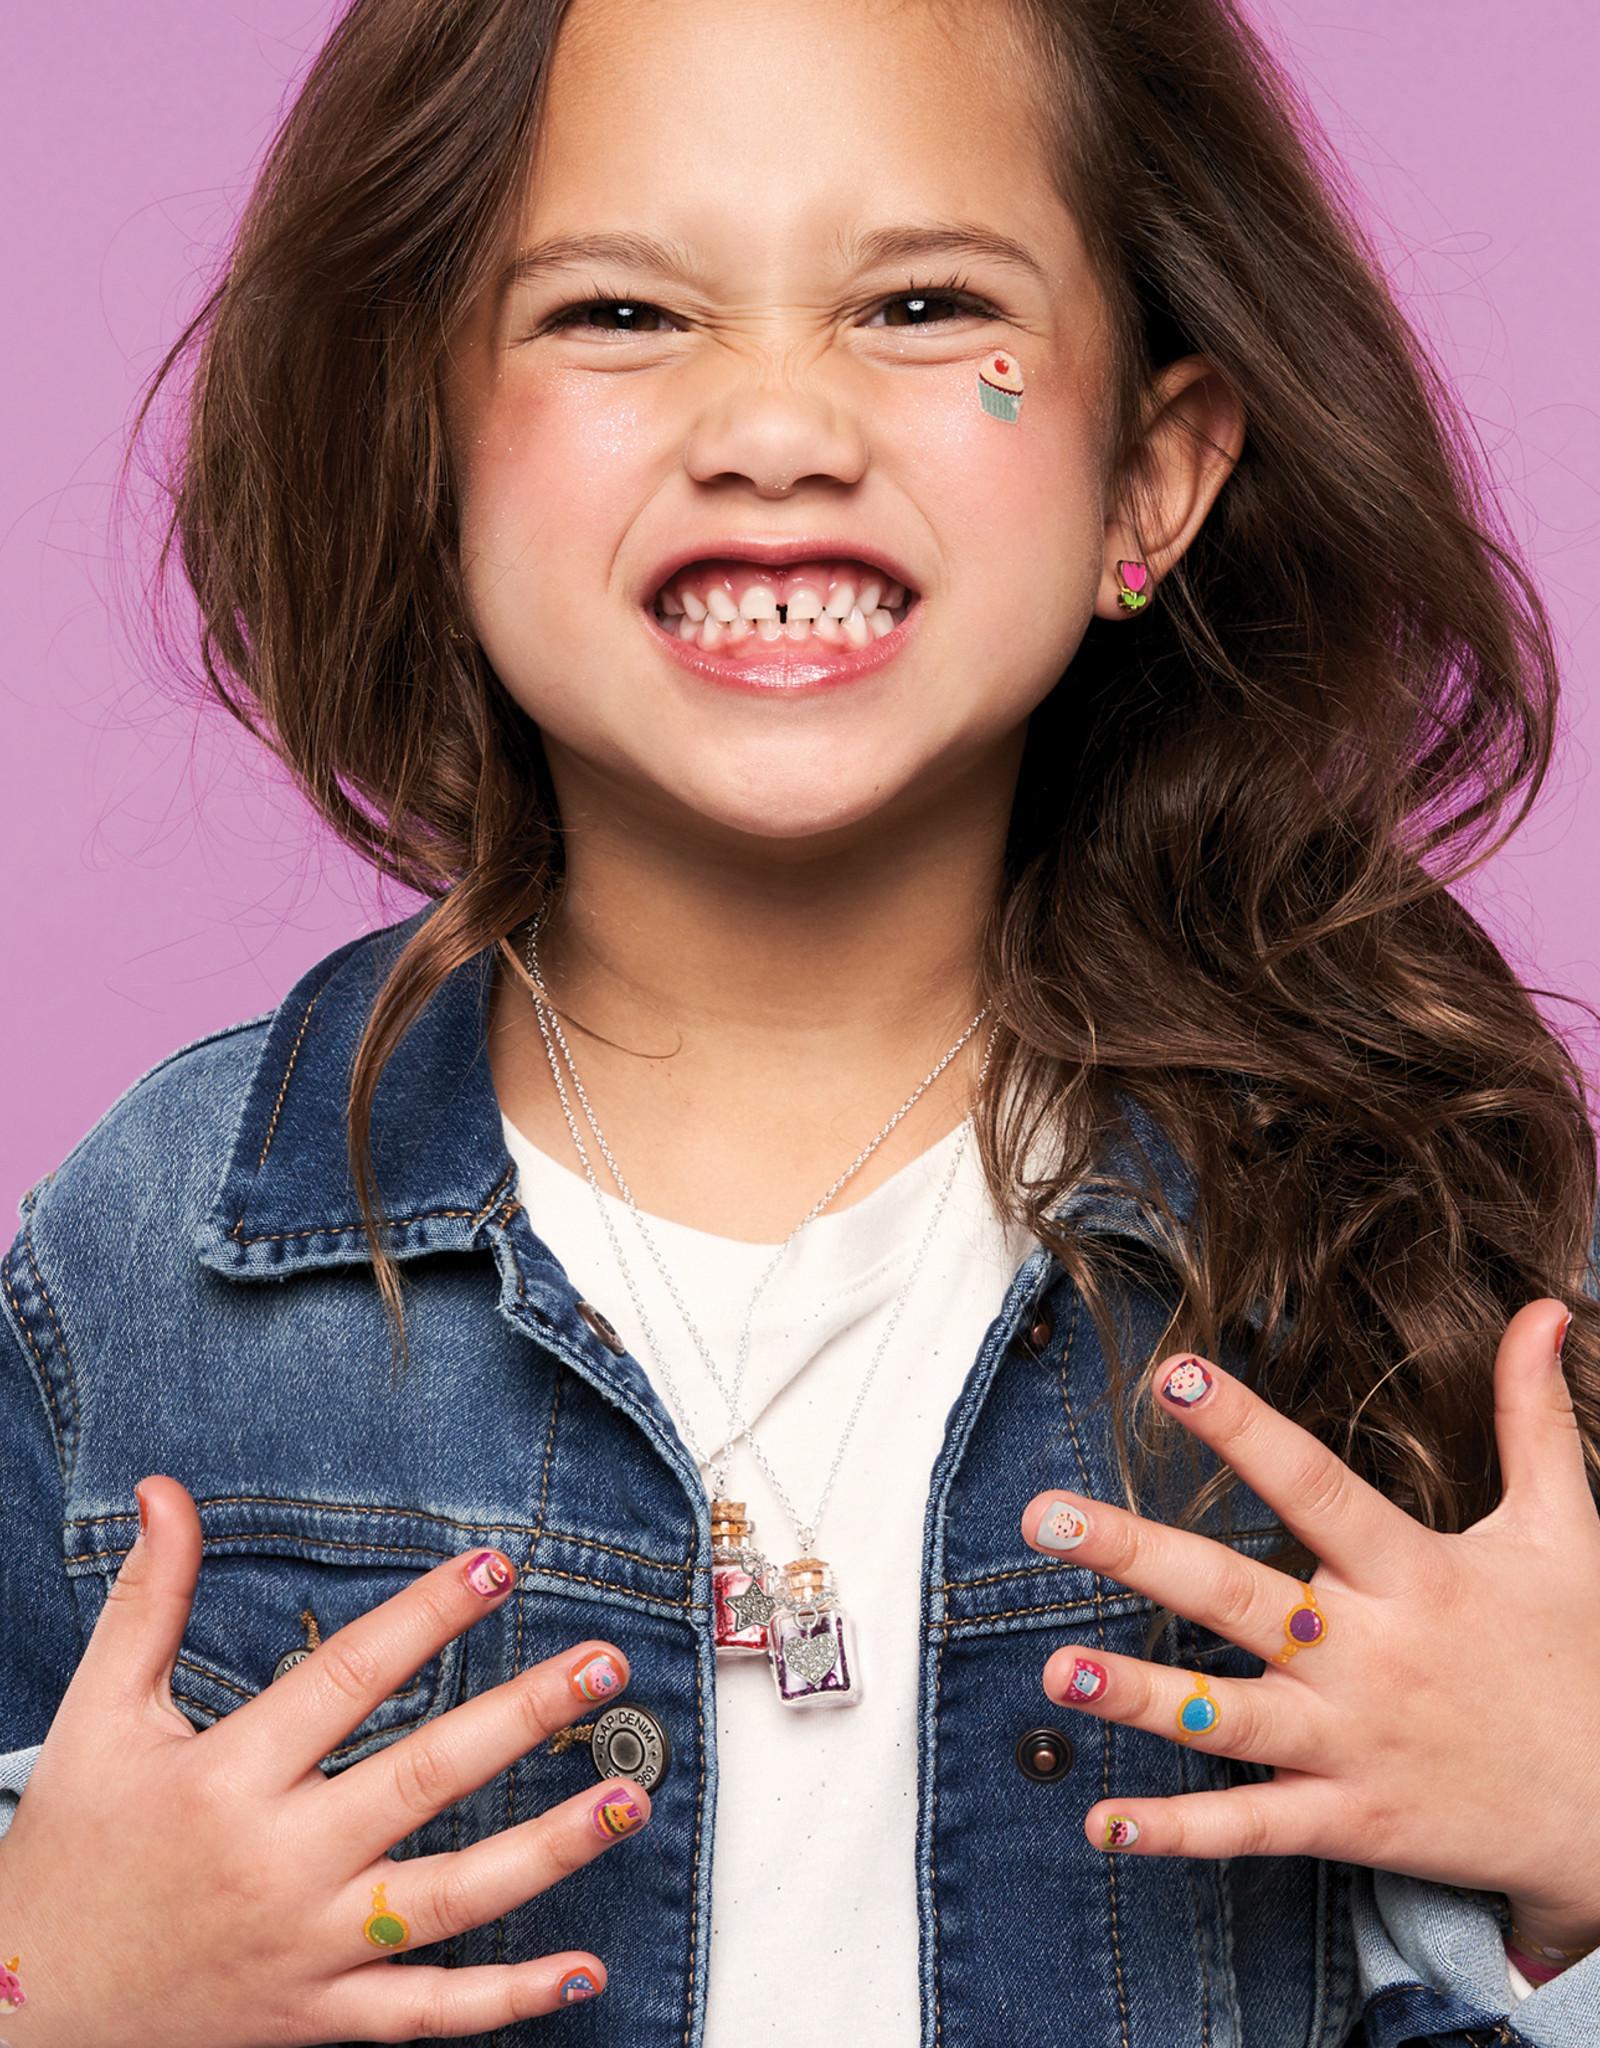 Girl Nation Collier avec gemmes de naissance - Juillet